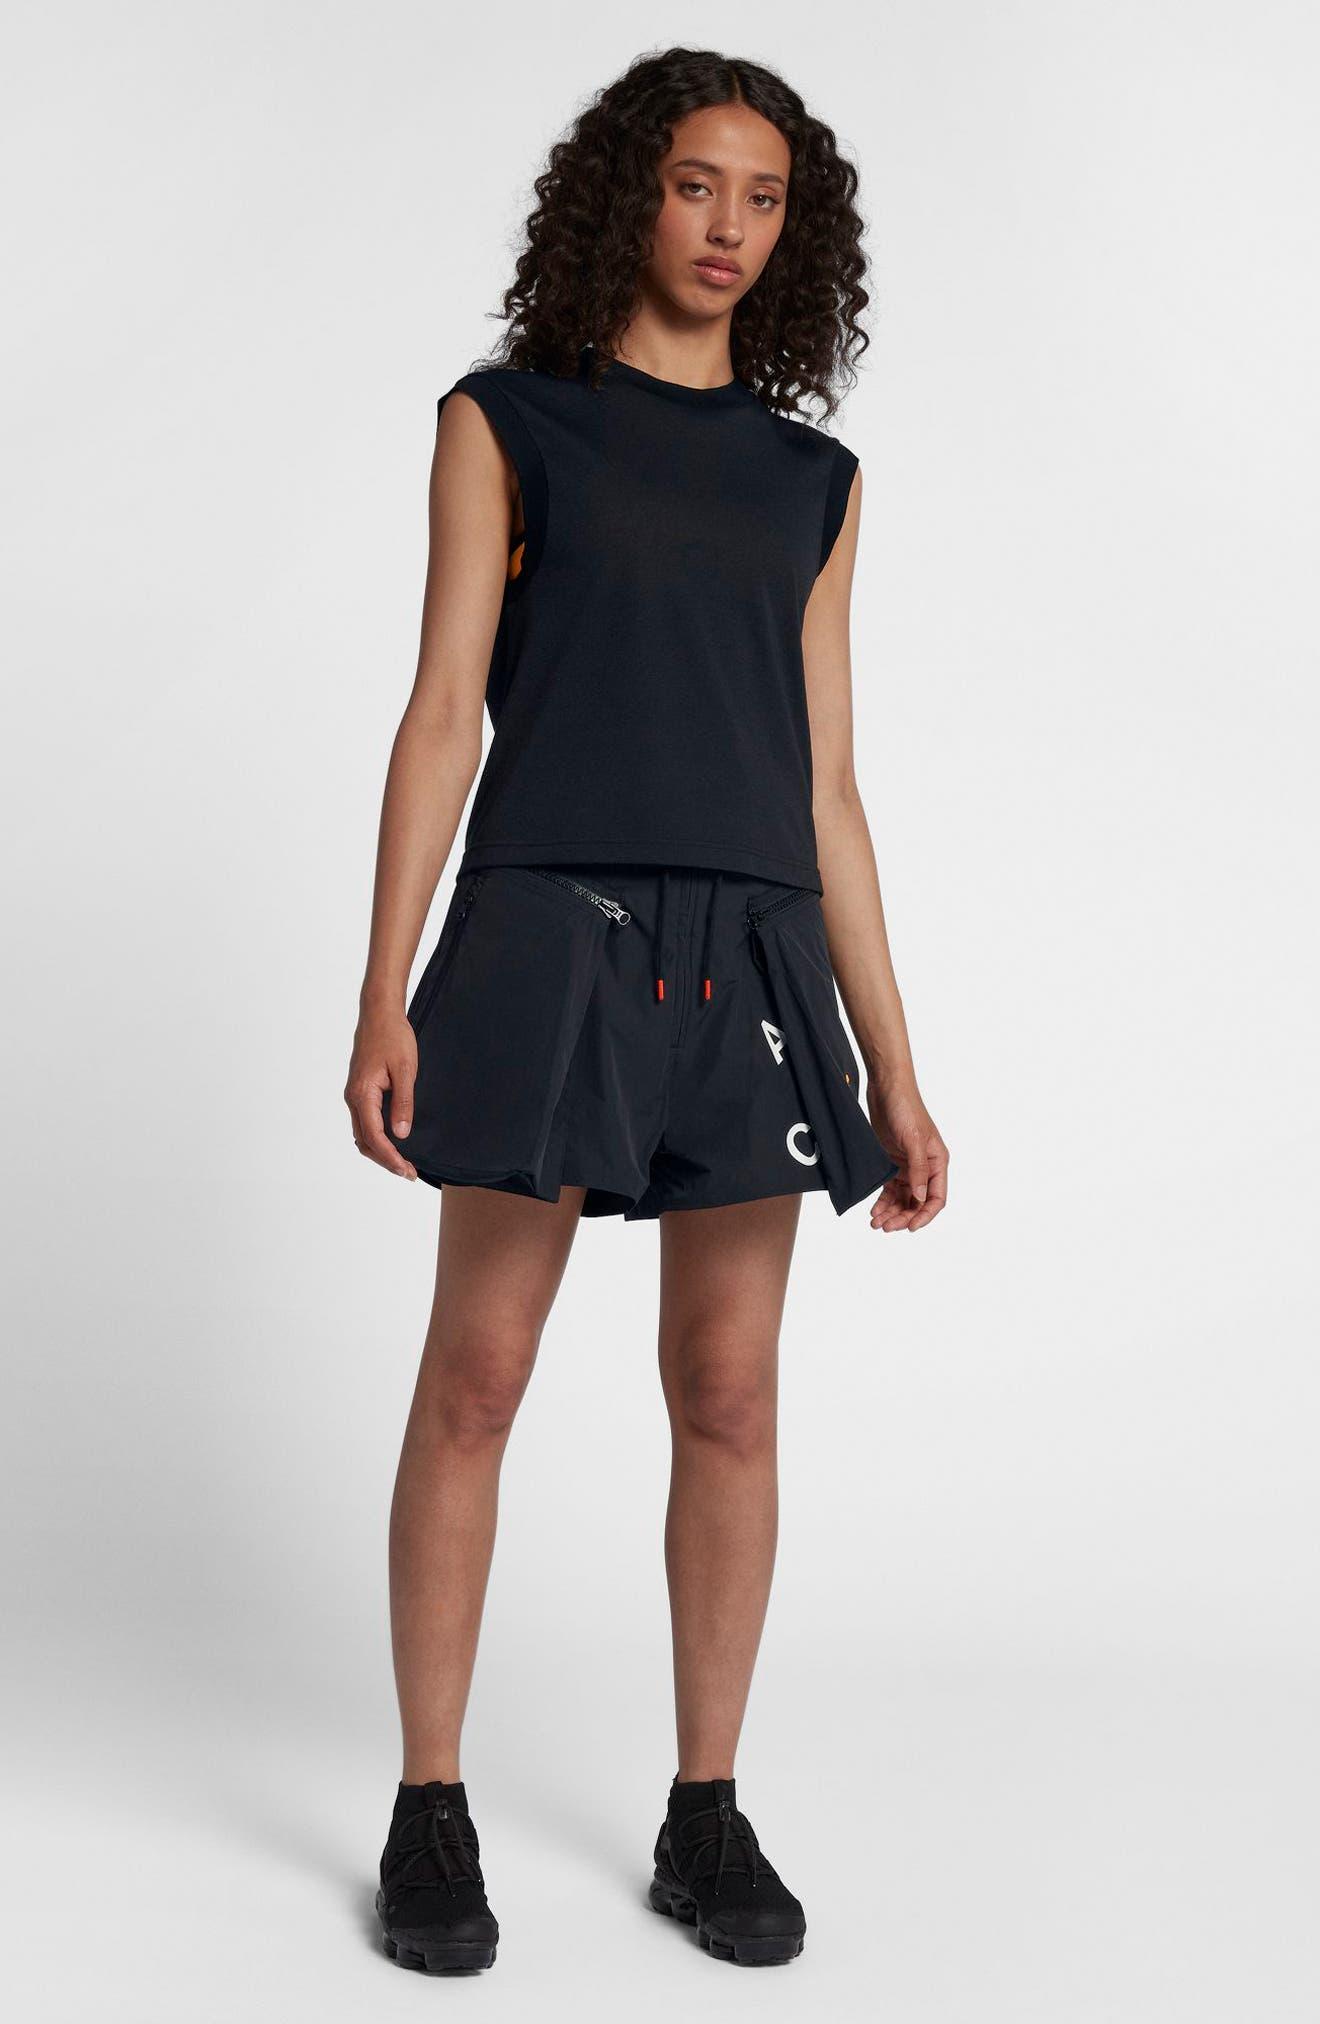 NIKE,                             NikeLab ACG Women's Sleeveless Top,                             Alternate thumbnail 7, color,                             010